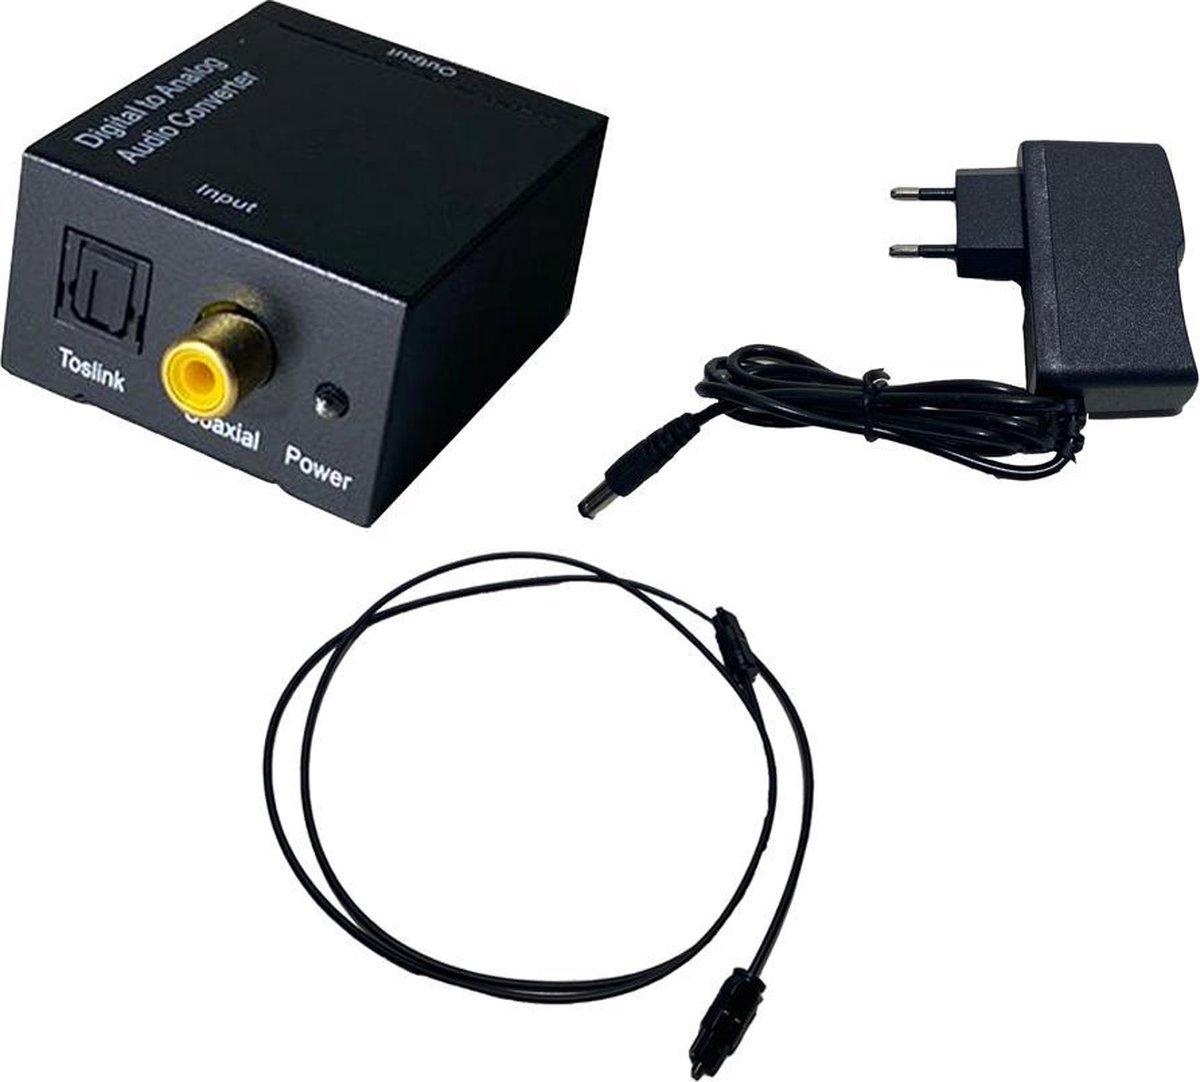 Digitaal naar analoog audio converter/omvormer, inclusief kabels,toslink,voeding